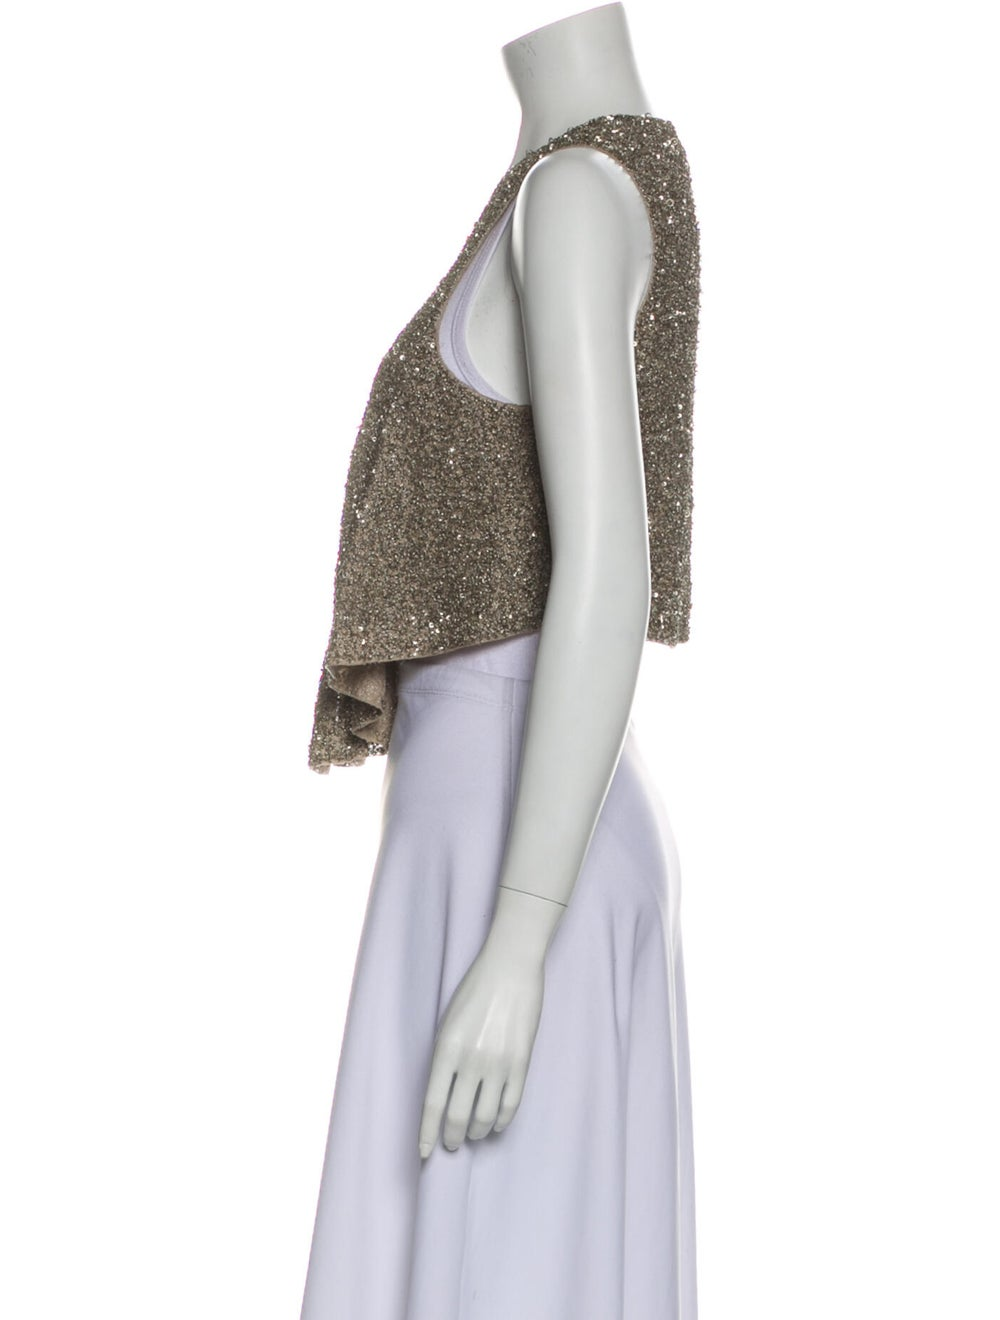 Gary Graham Vintage Linen Vest - image 2